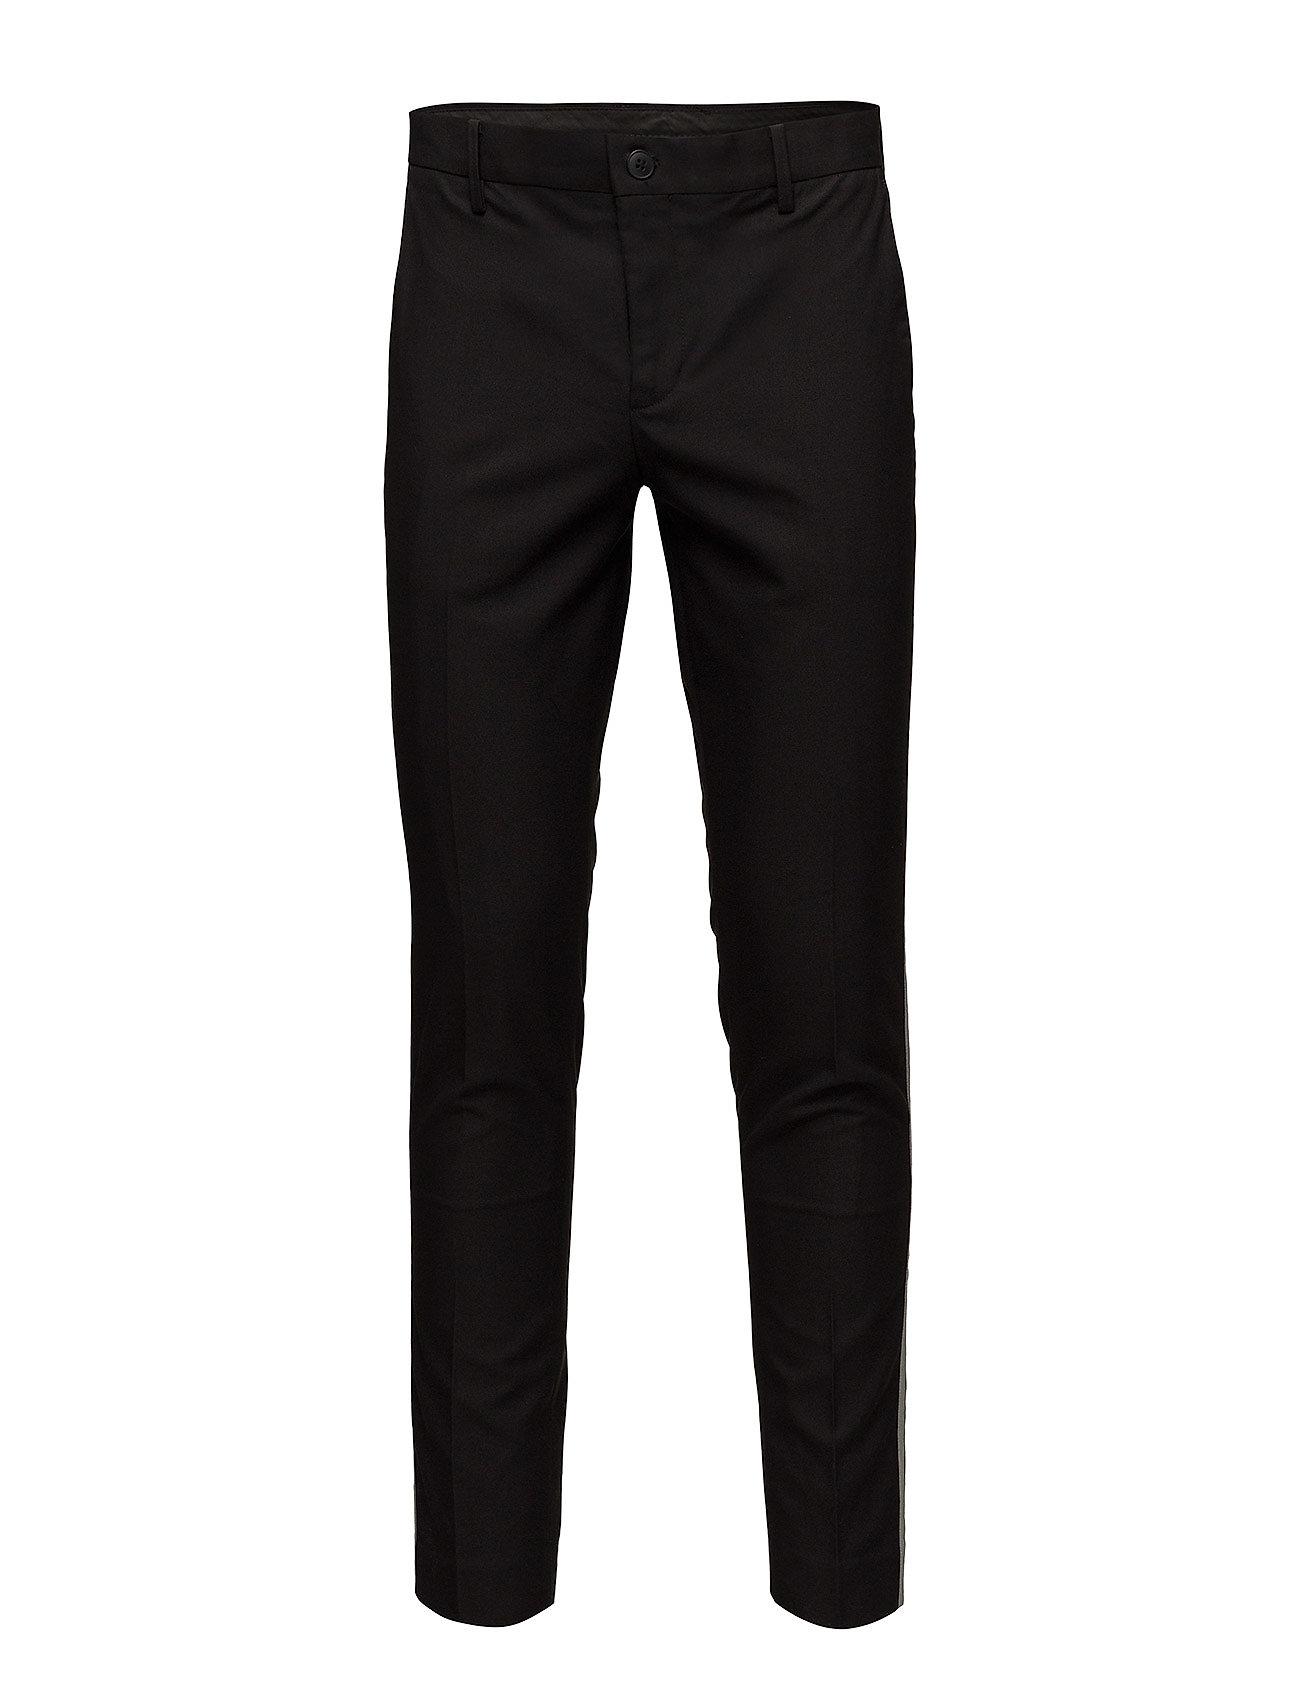 JUNK de LUXE Contrast tape club pants - BLACK